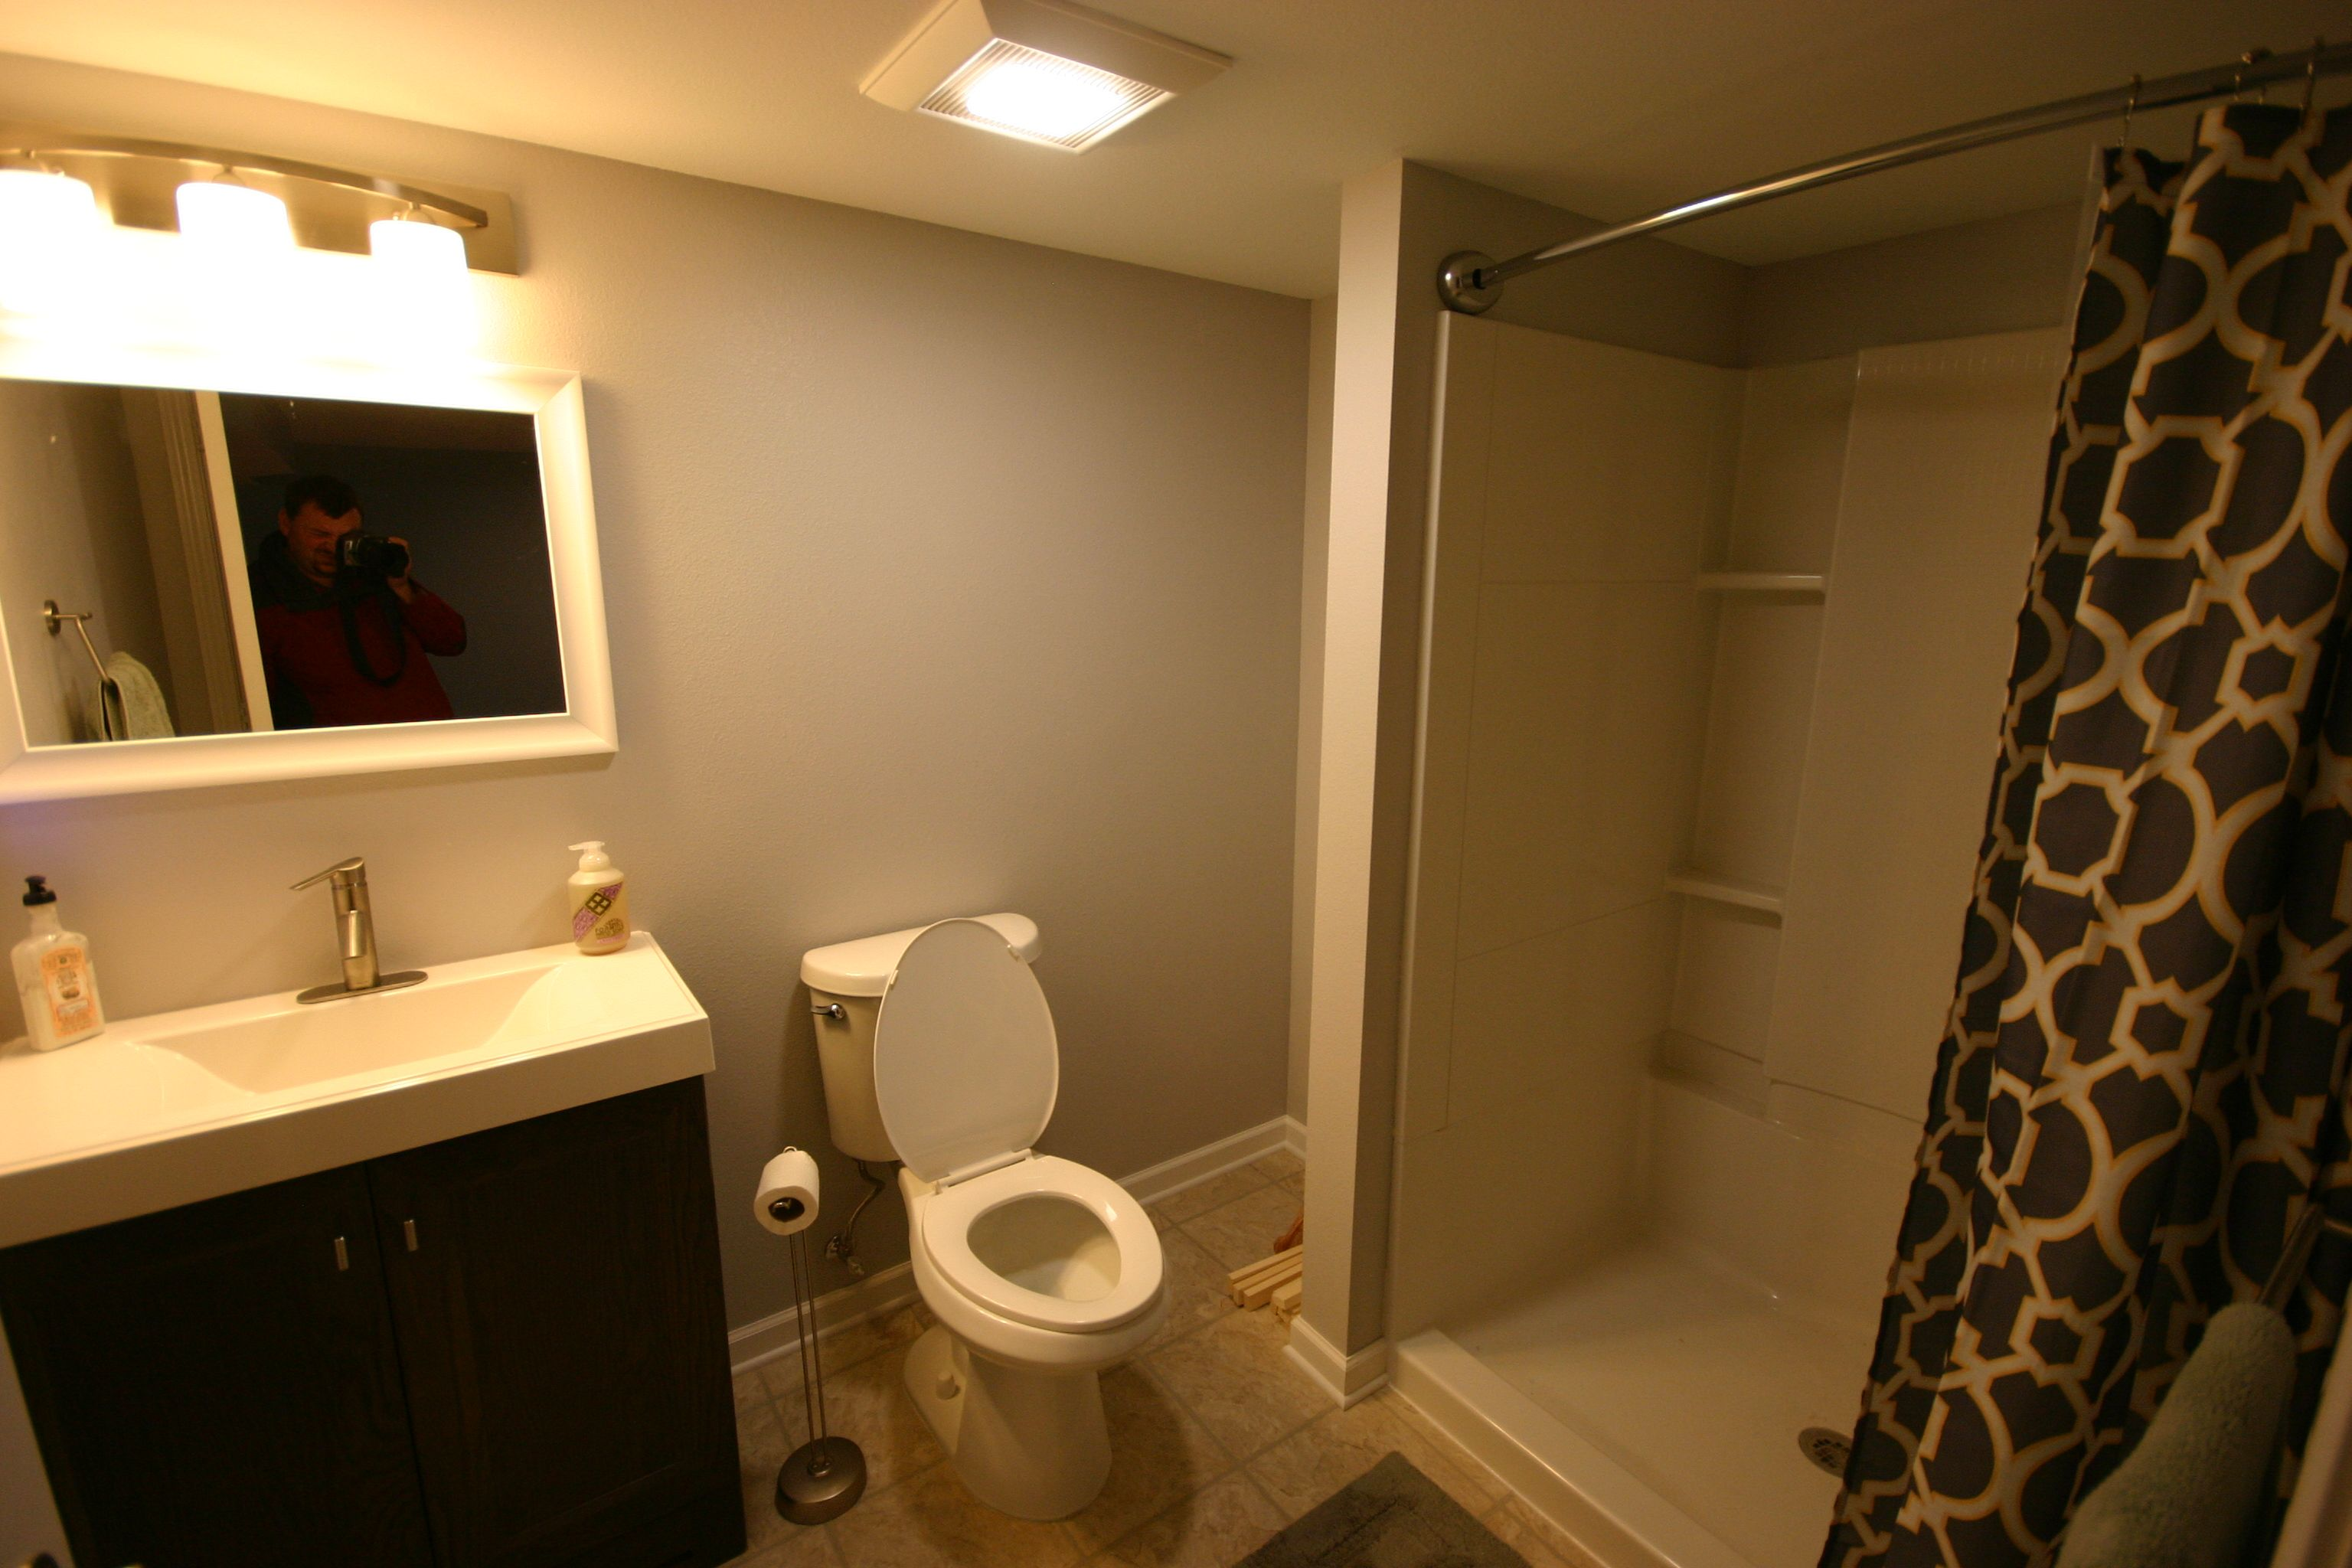 Basement Finish Basement Bedroomdrywall Soffits Basement Carpet - Basement bedroom egress